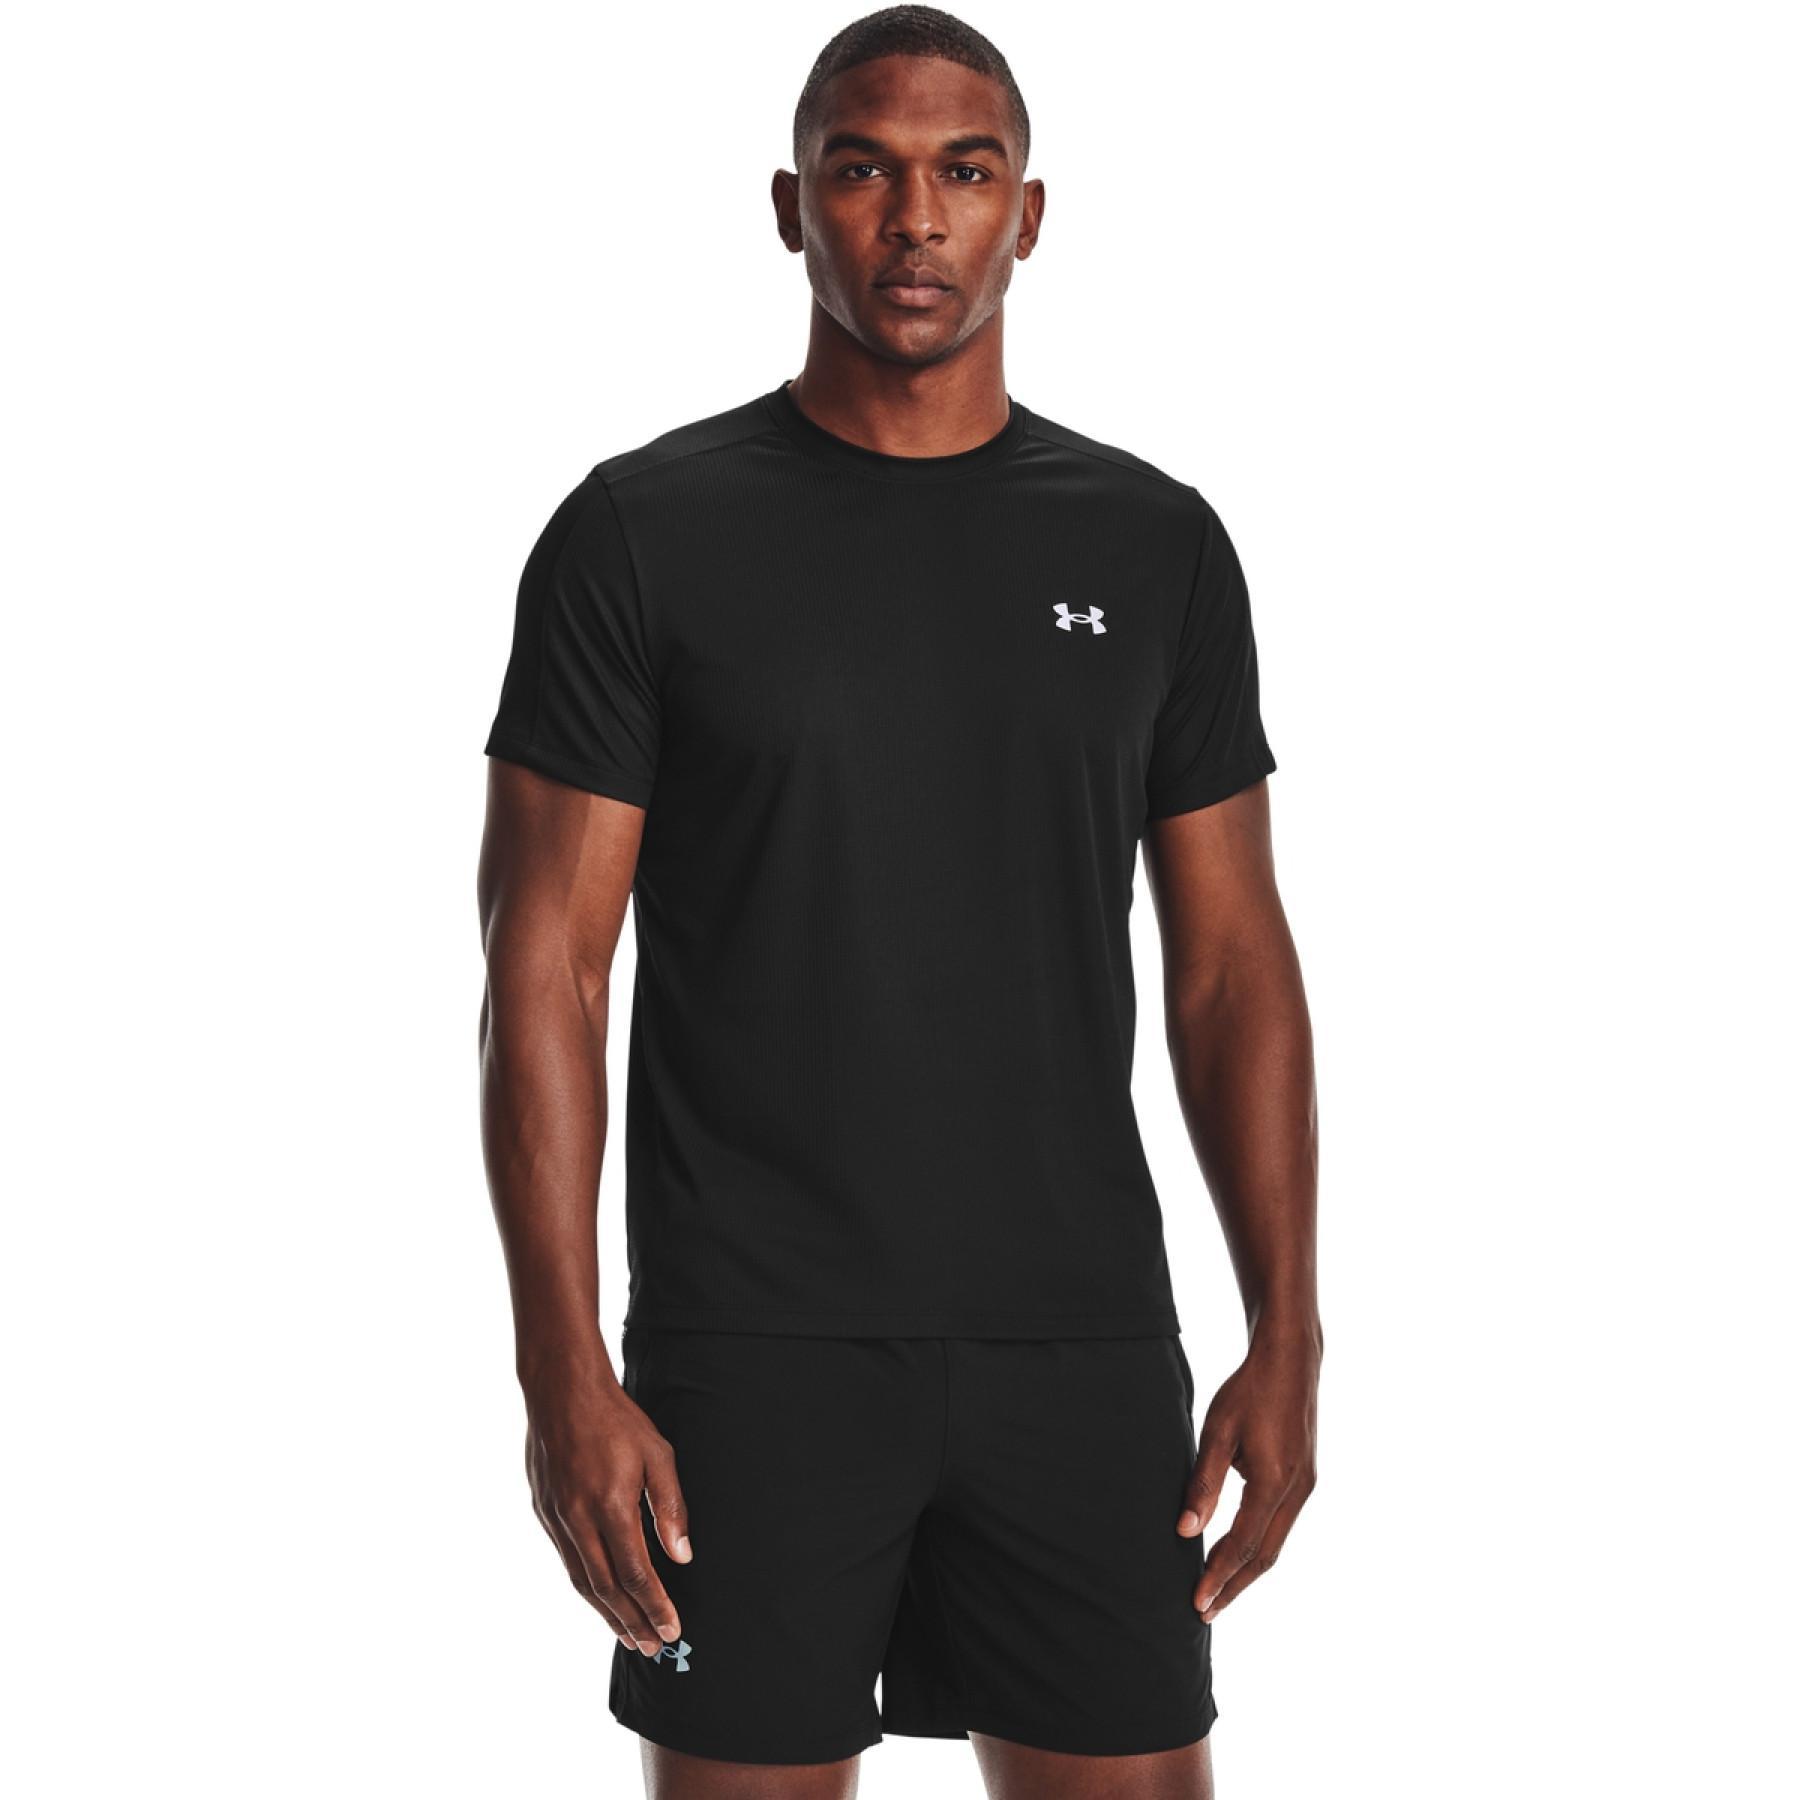 Under Armour Short Sleeve Speed Stride T-Shirt